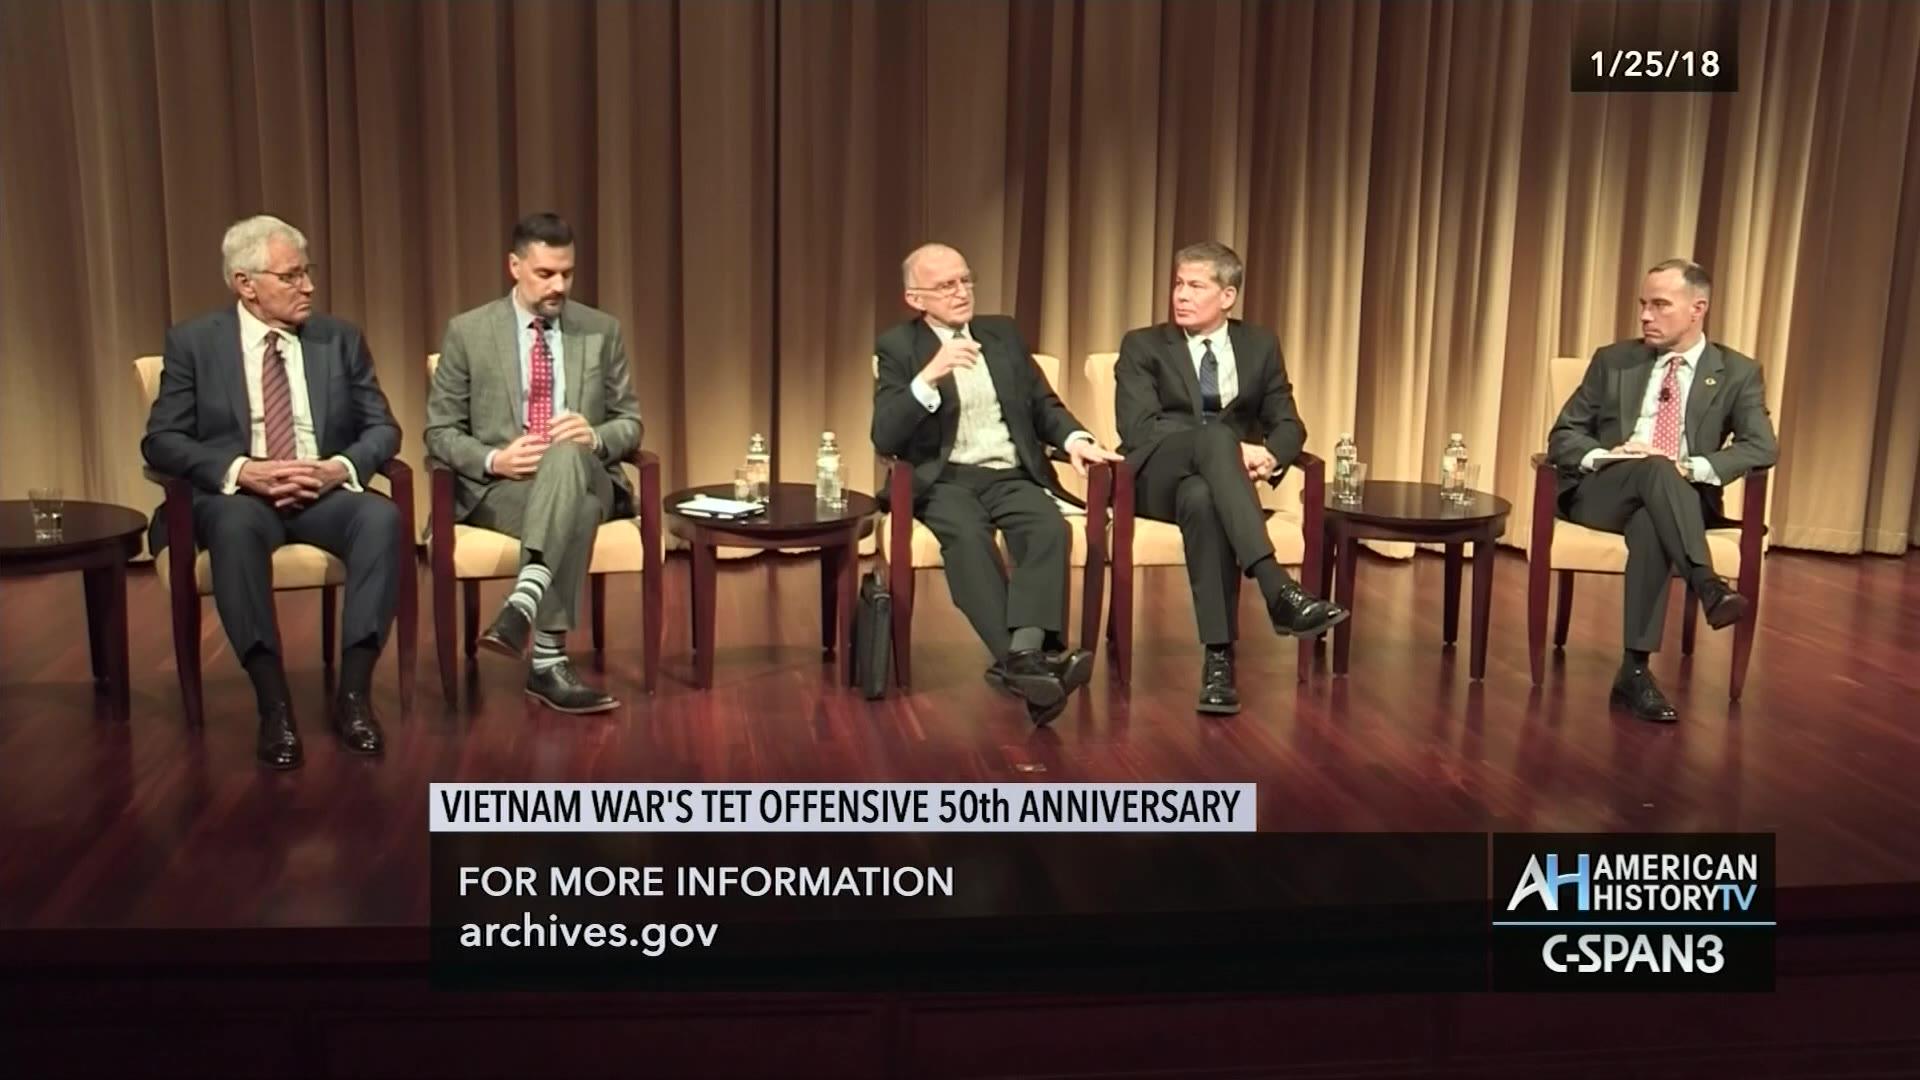 Vietnam War's Tet Offensive 50th Anniversary